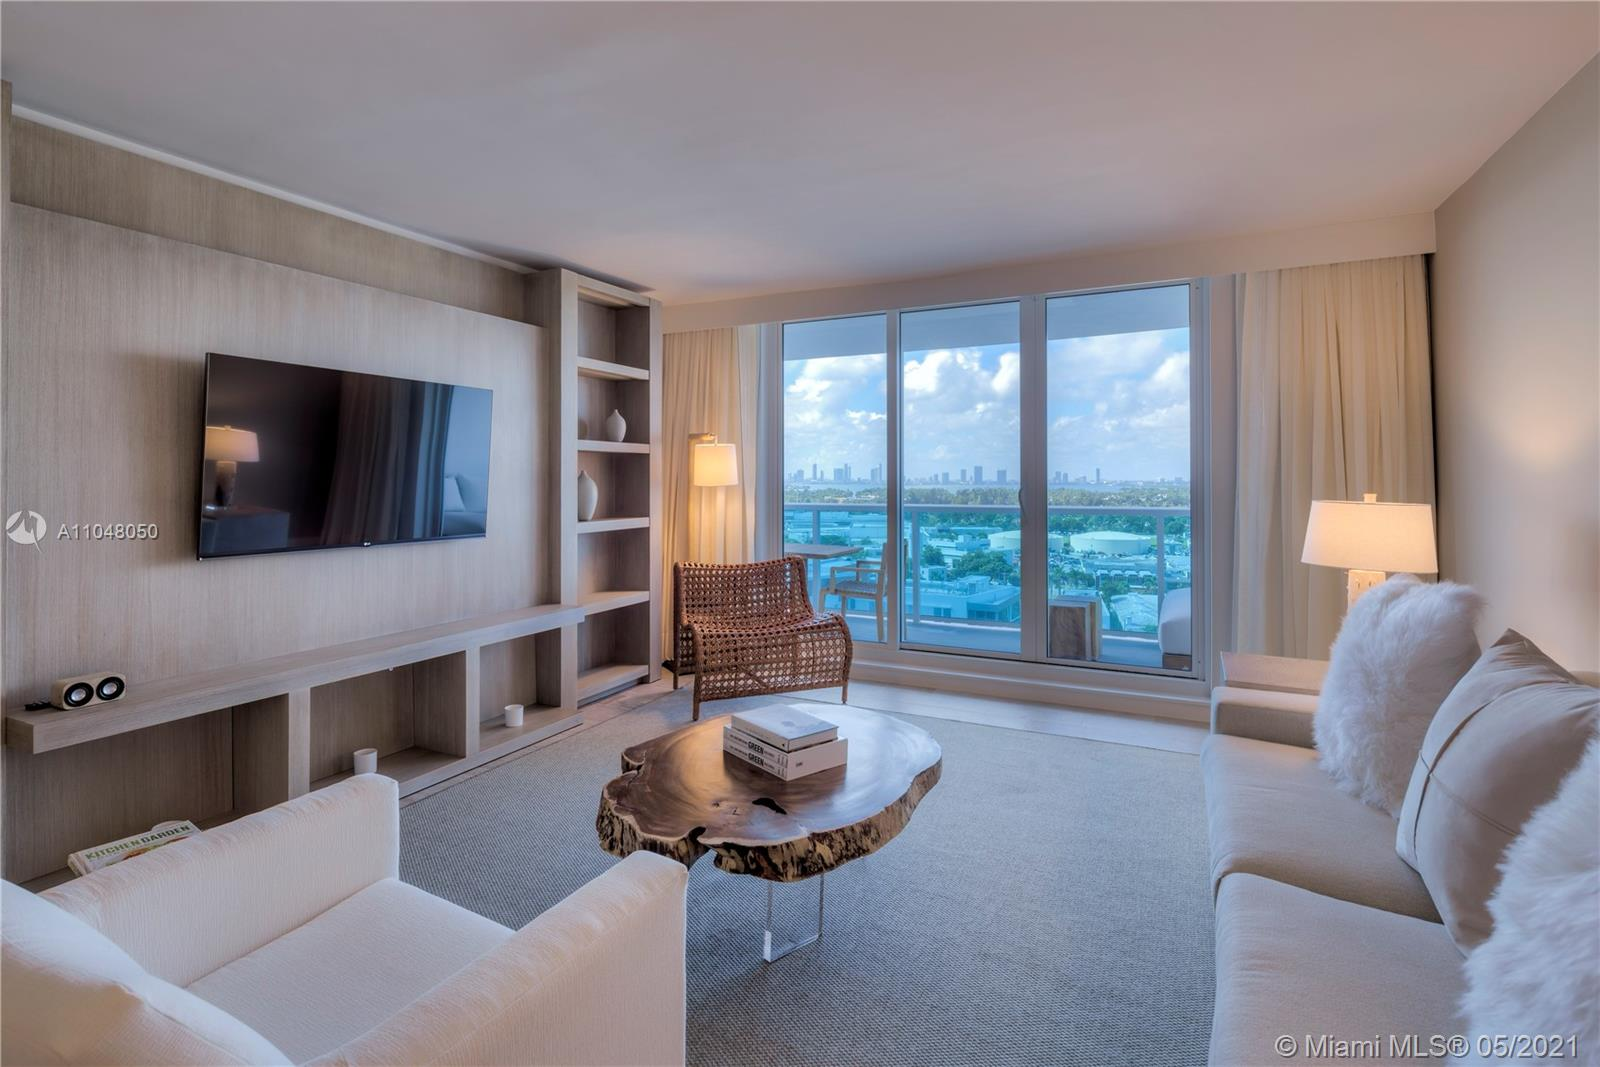 1 Hotel & Homes #1527 - 102 24th St #1527, Miami Beach, FL 33139